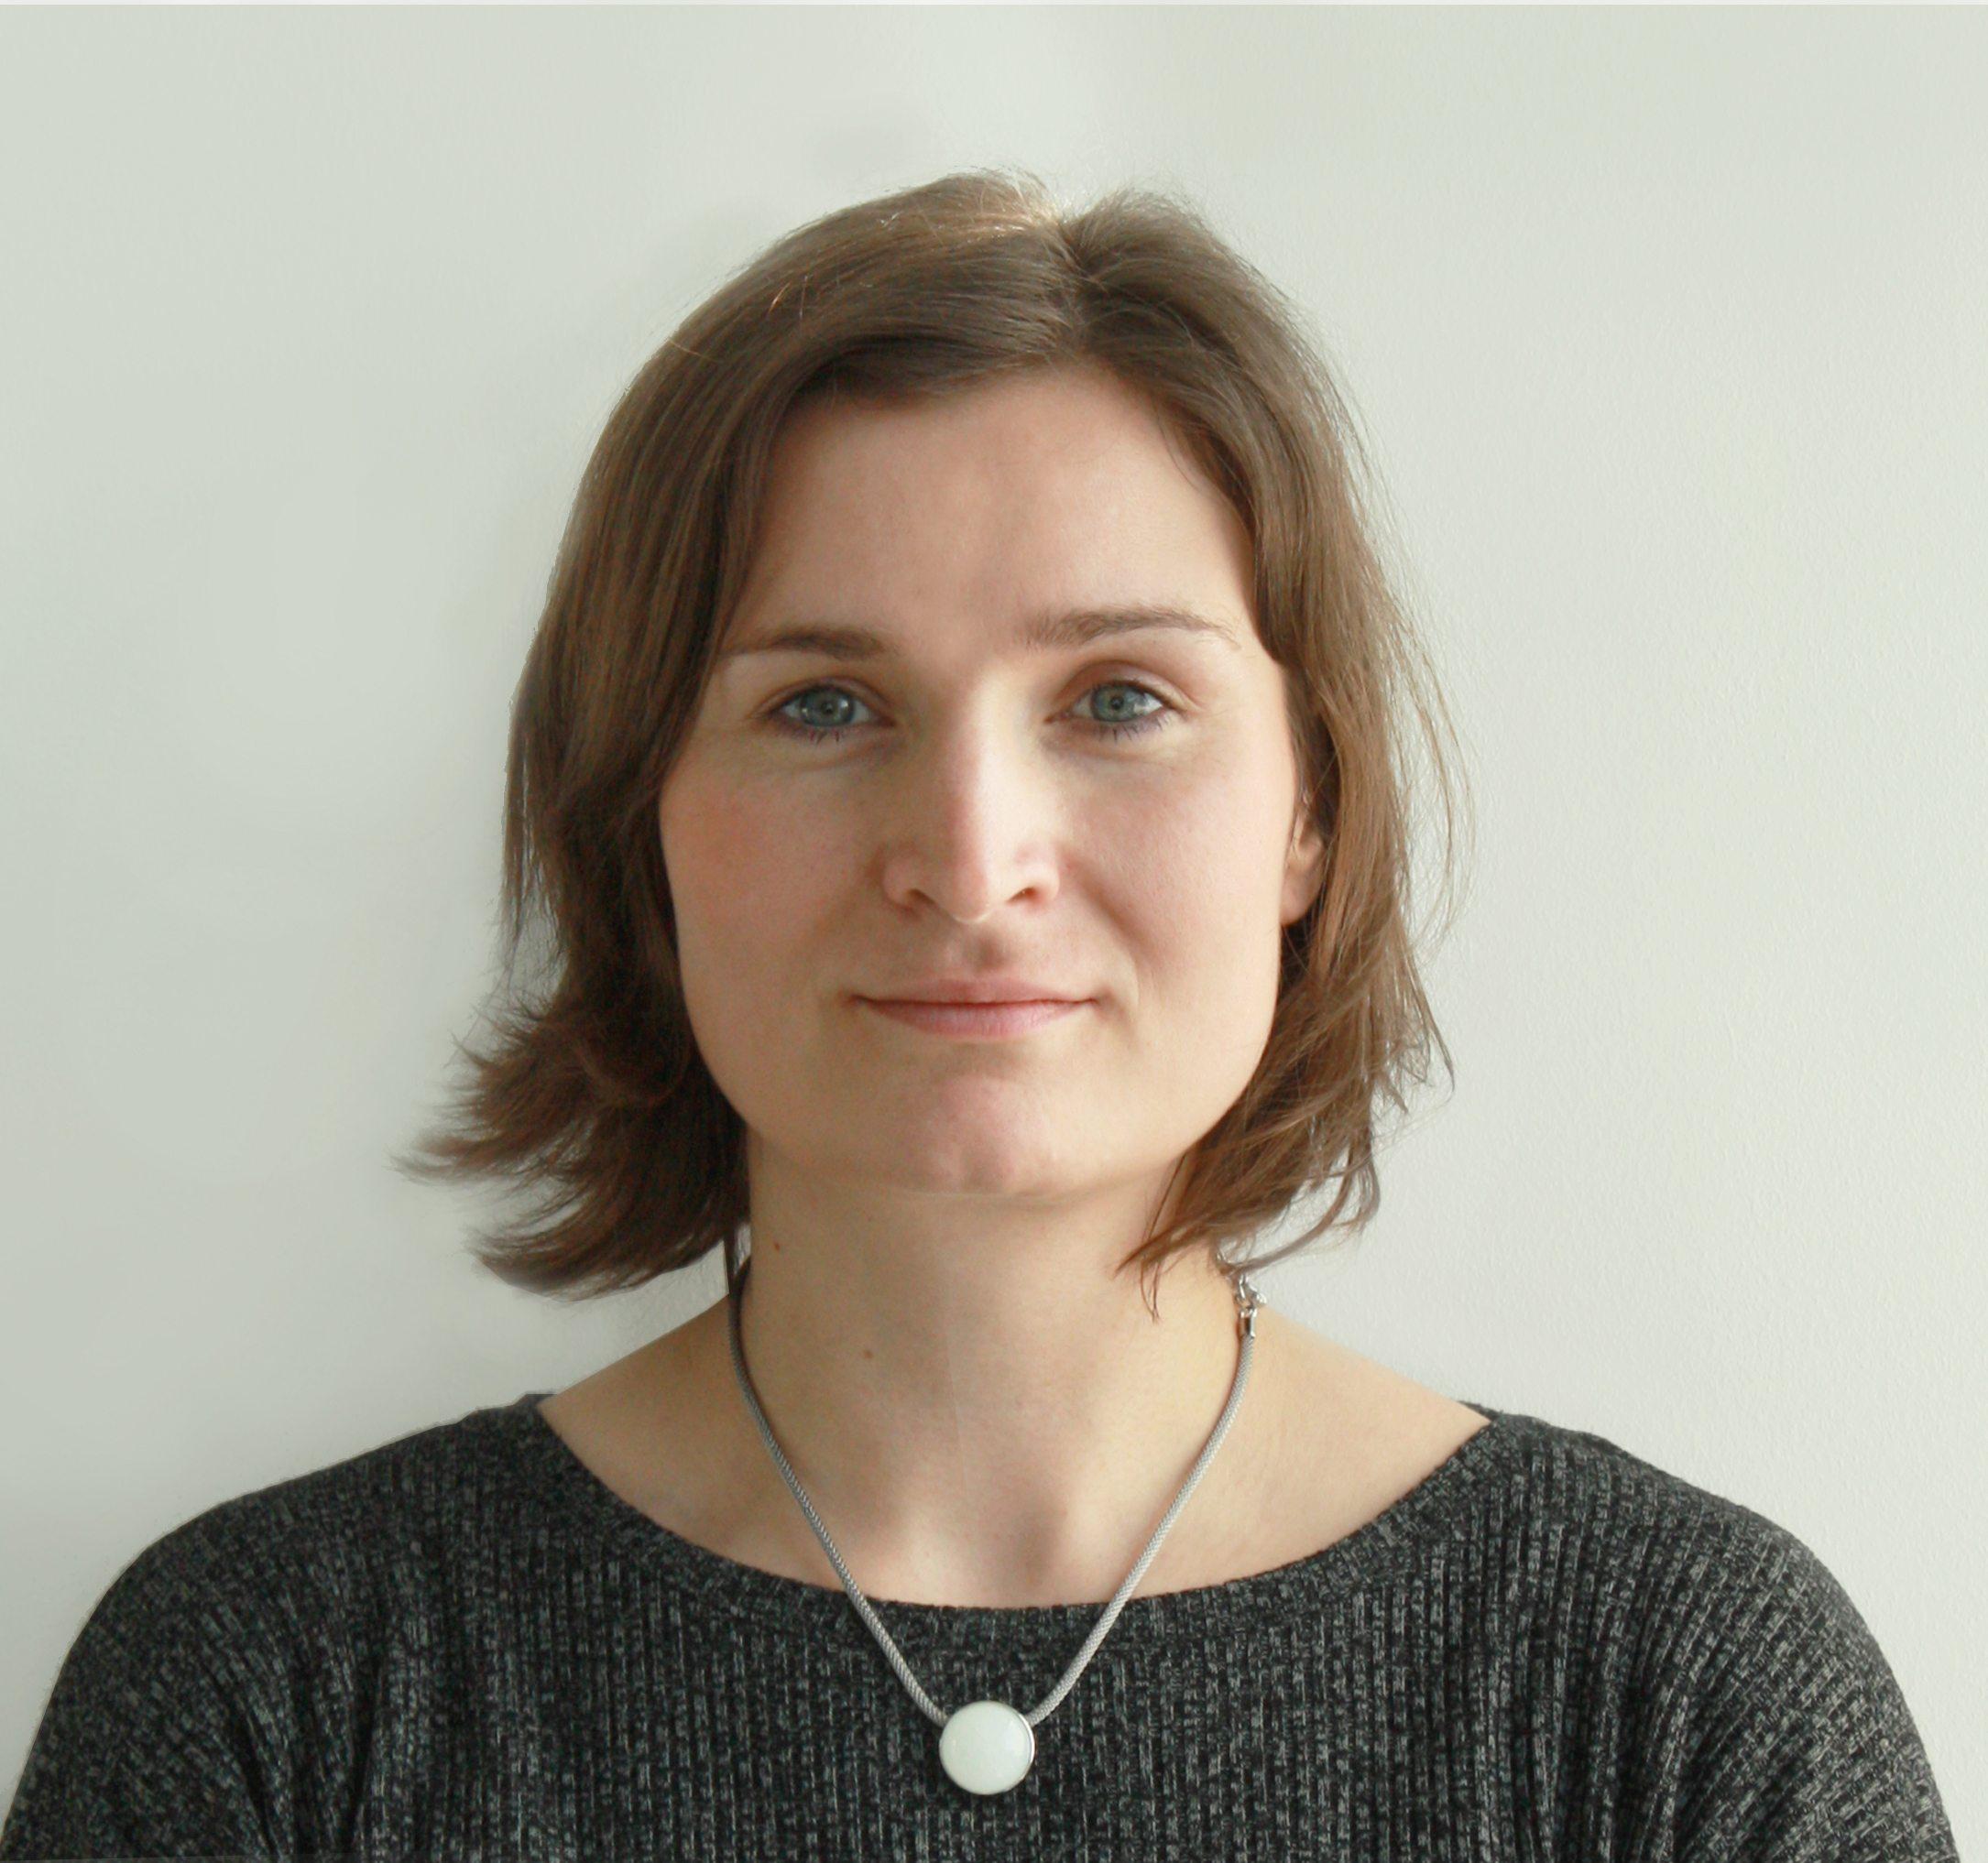 Maria Kossak